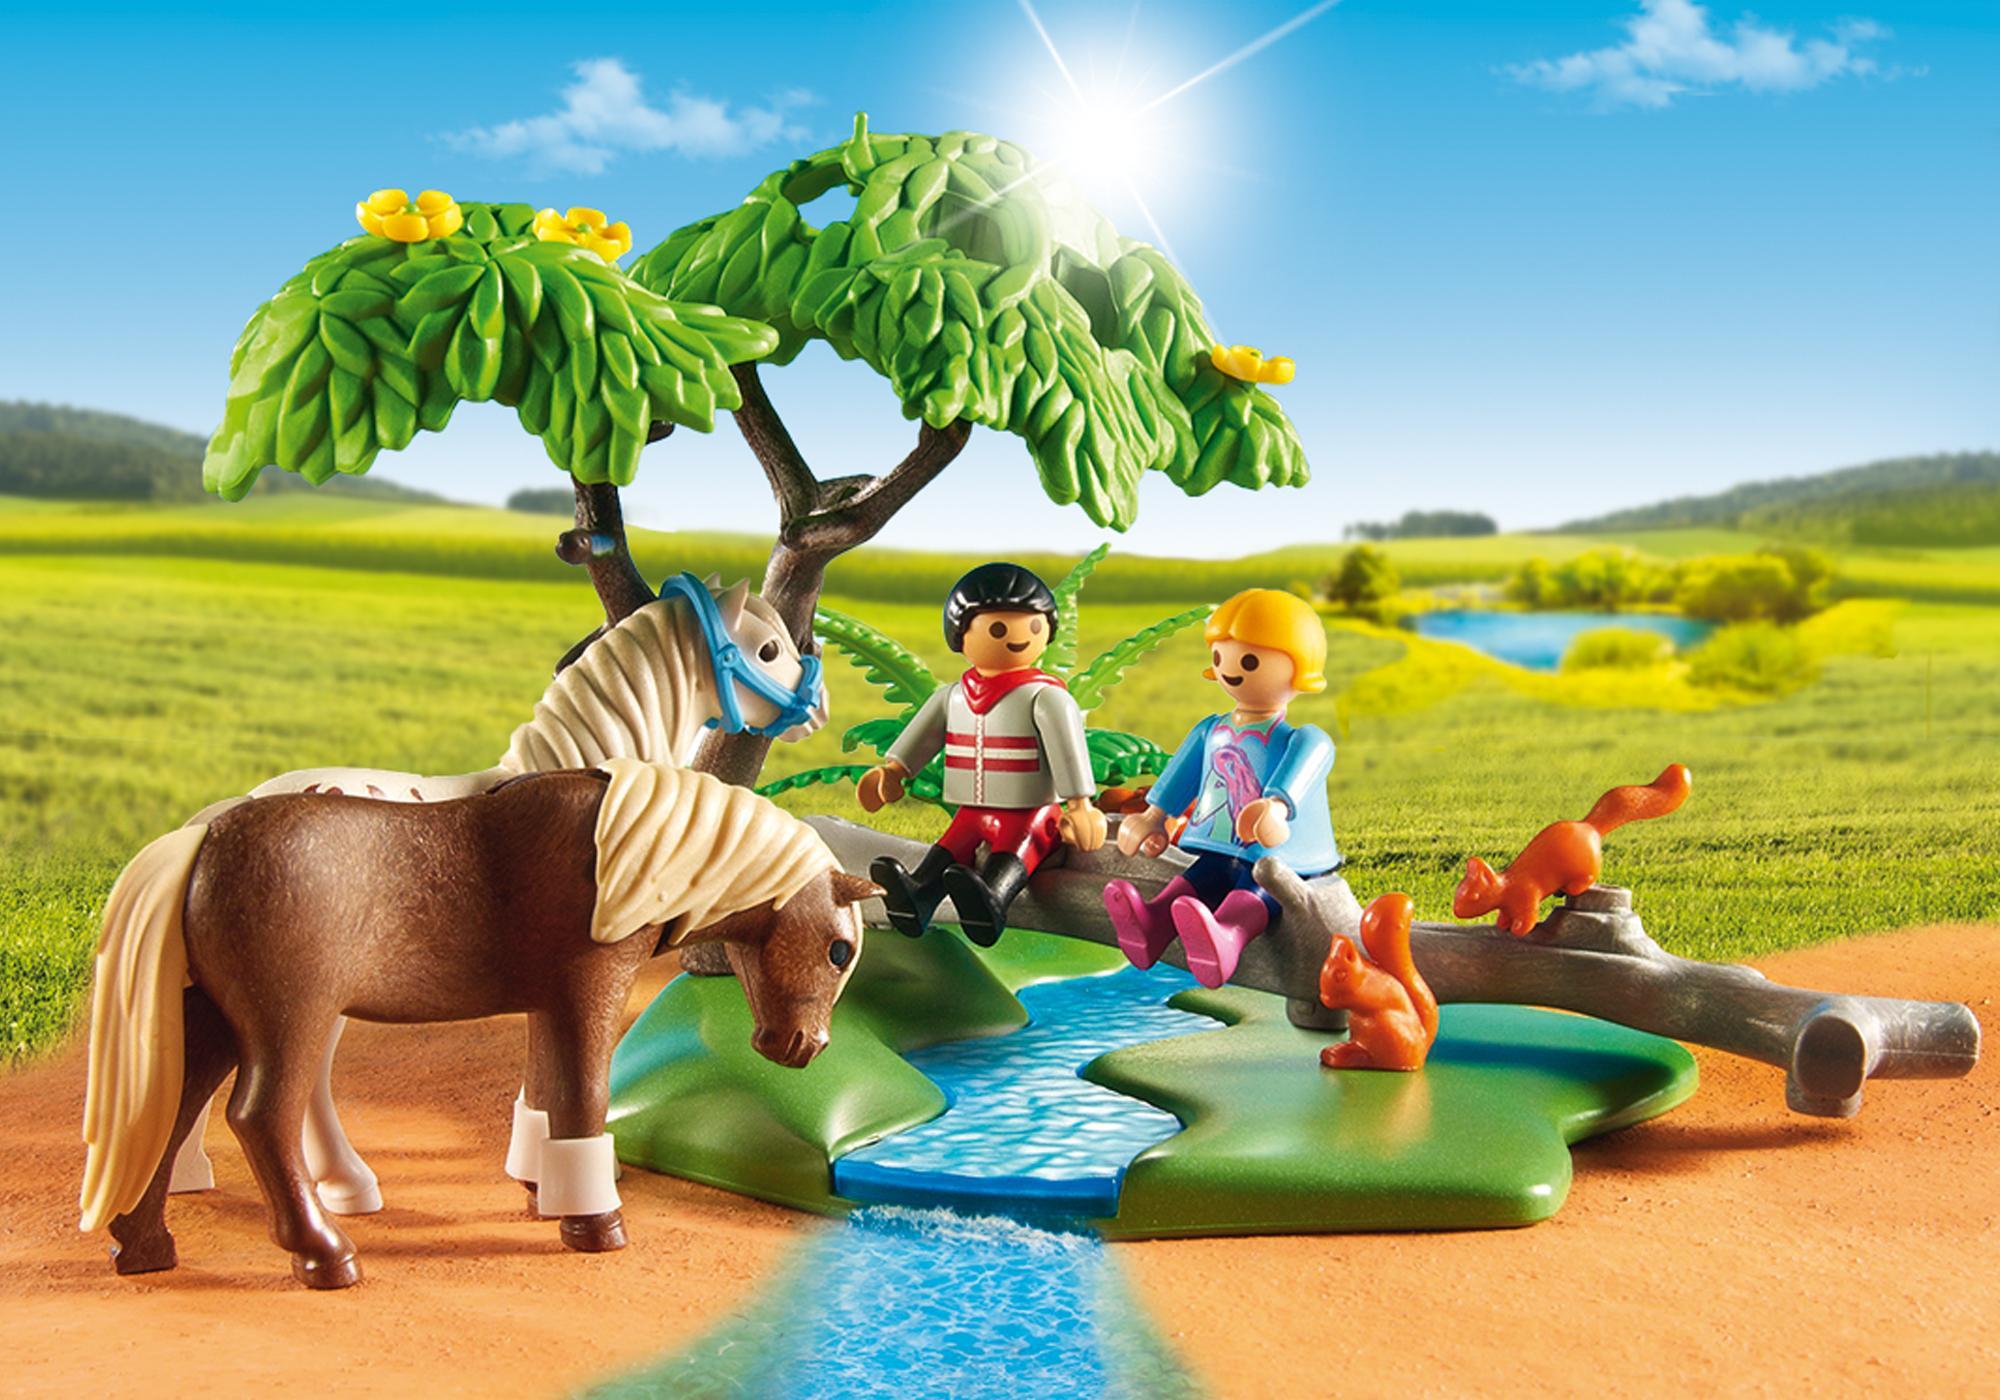 http://media.playmobil.com/i/playmobil/6947_product_extra1/Cavaliers avec poneys et cheval